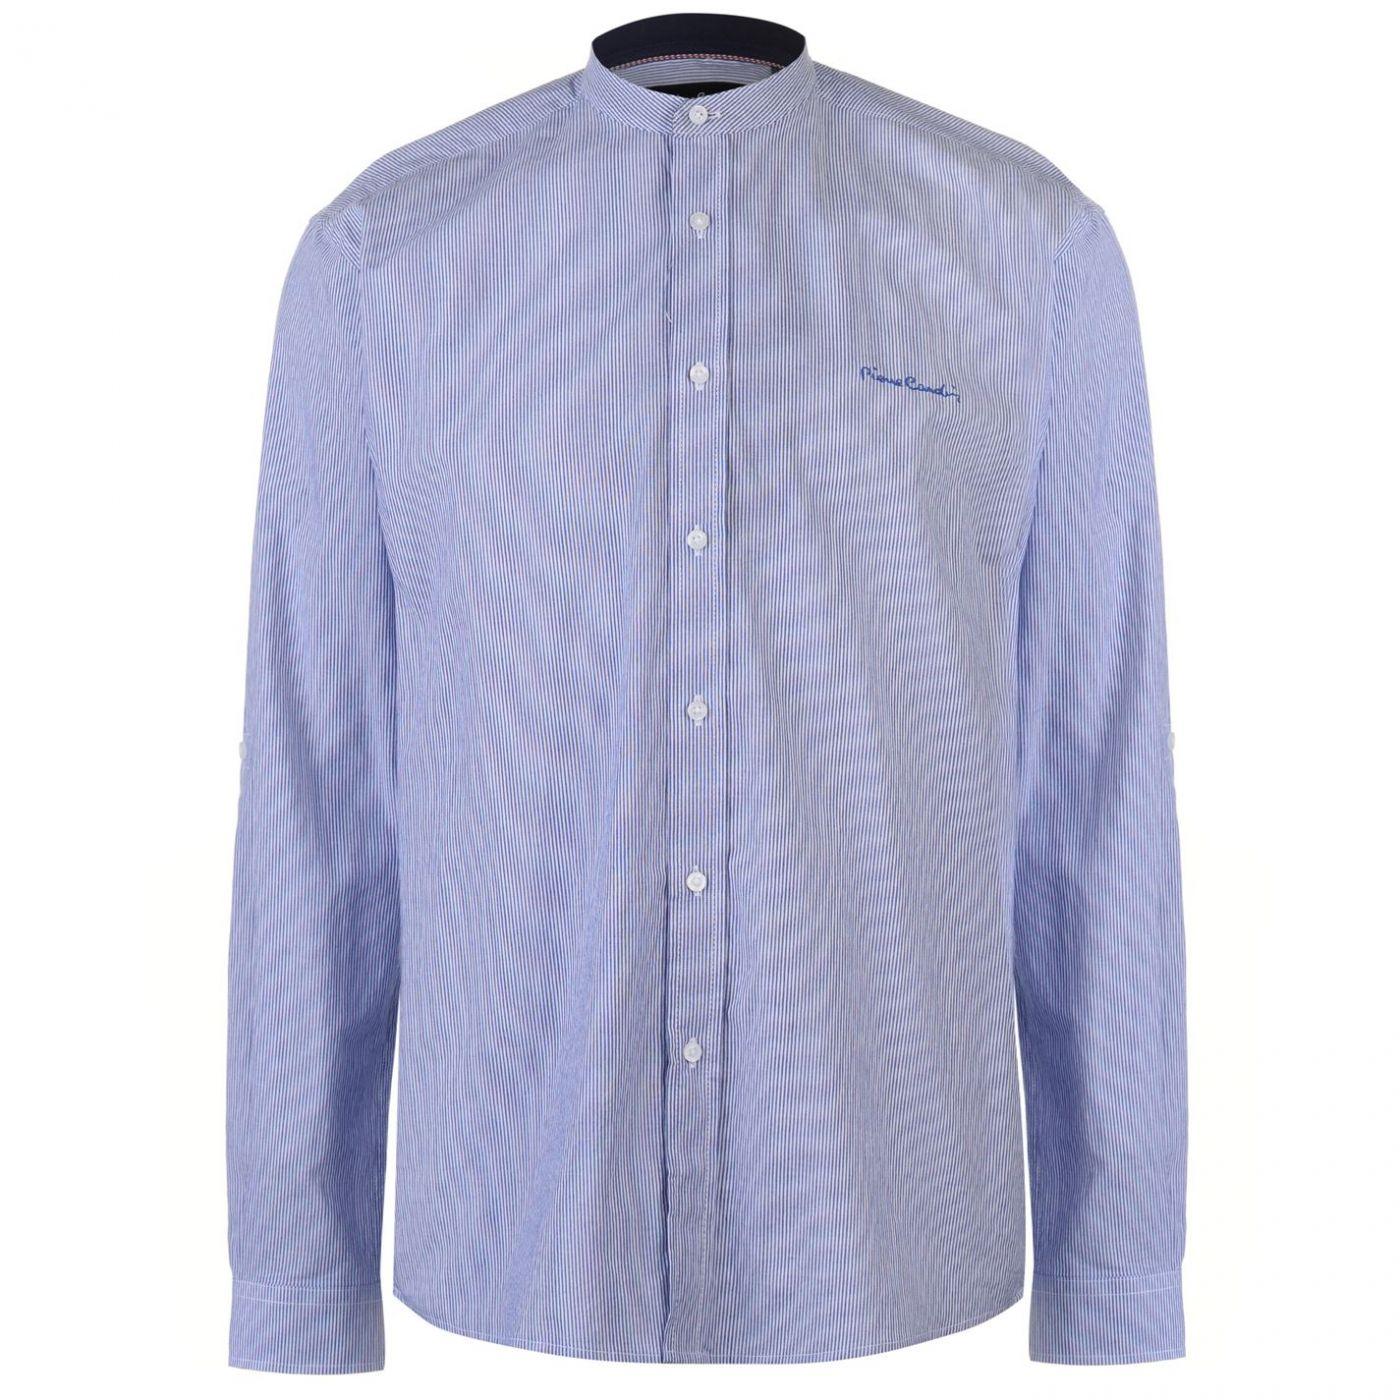 Pierre Cardin Collarless Long Sleeve Stripe Shirt Mens